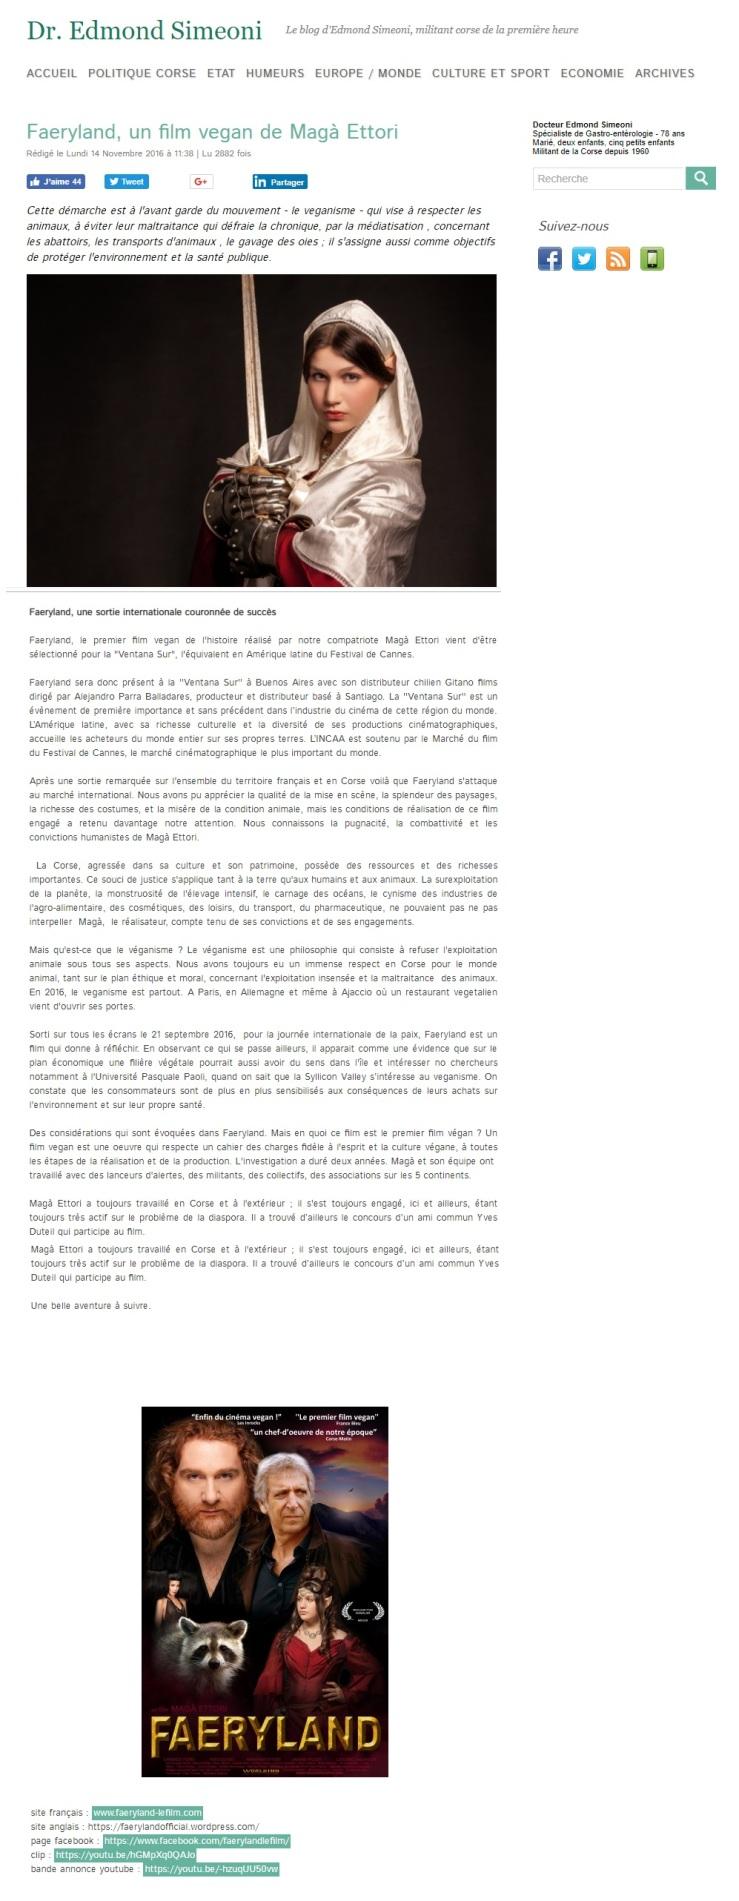 Edmond Simeoni - Faeryland, une sortie internationale couronnée de succès - 1.jpg